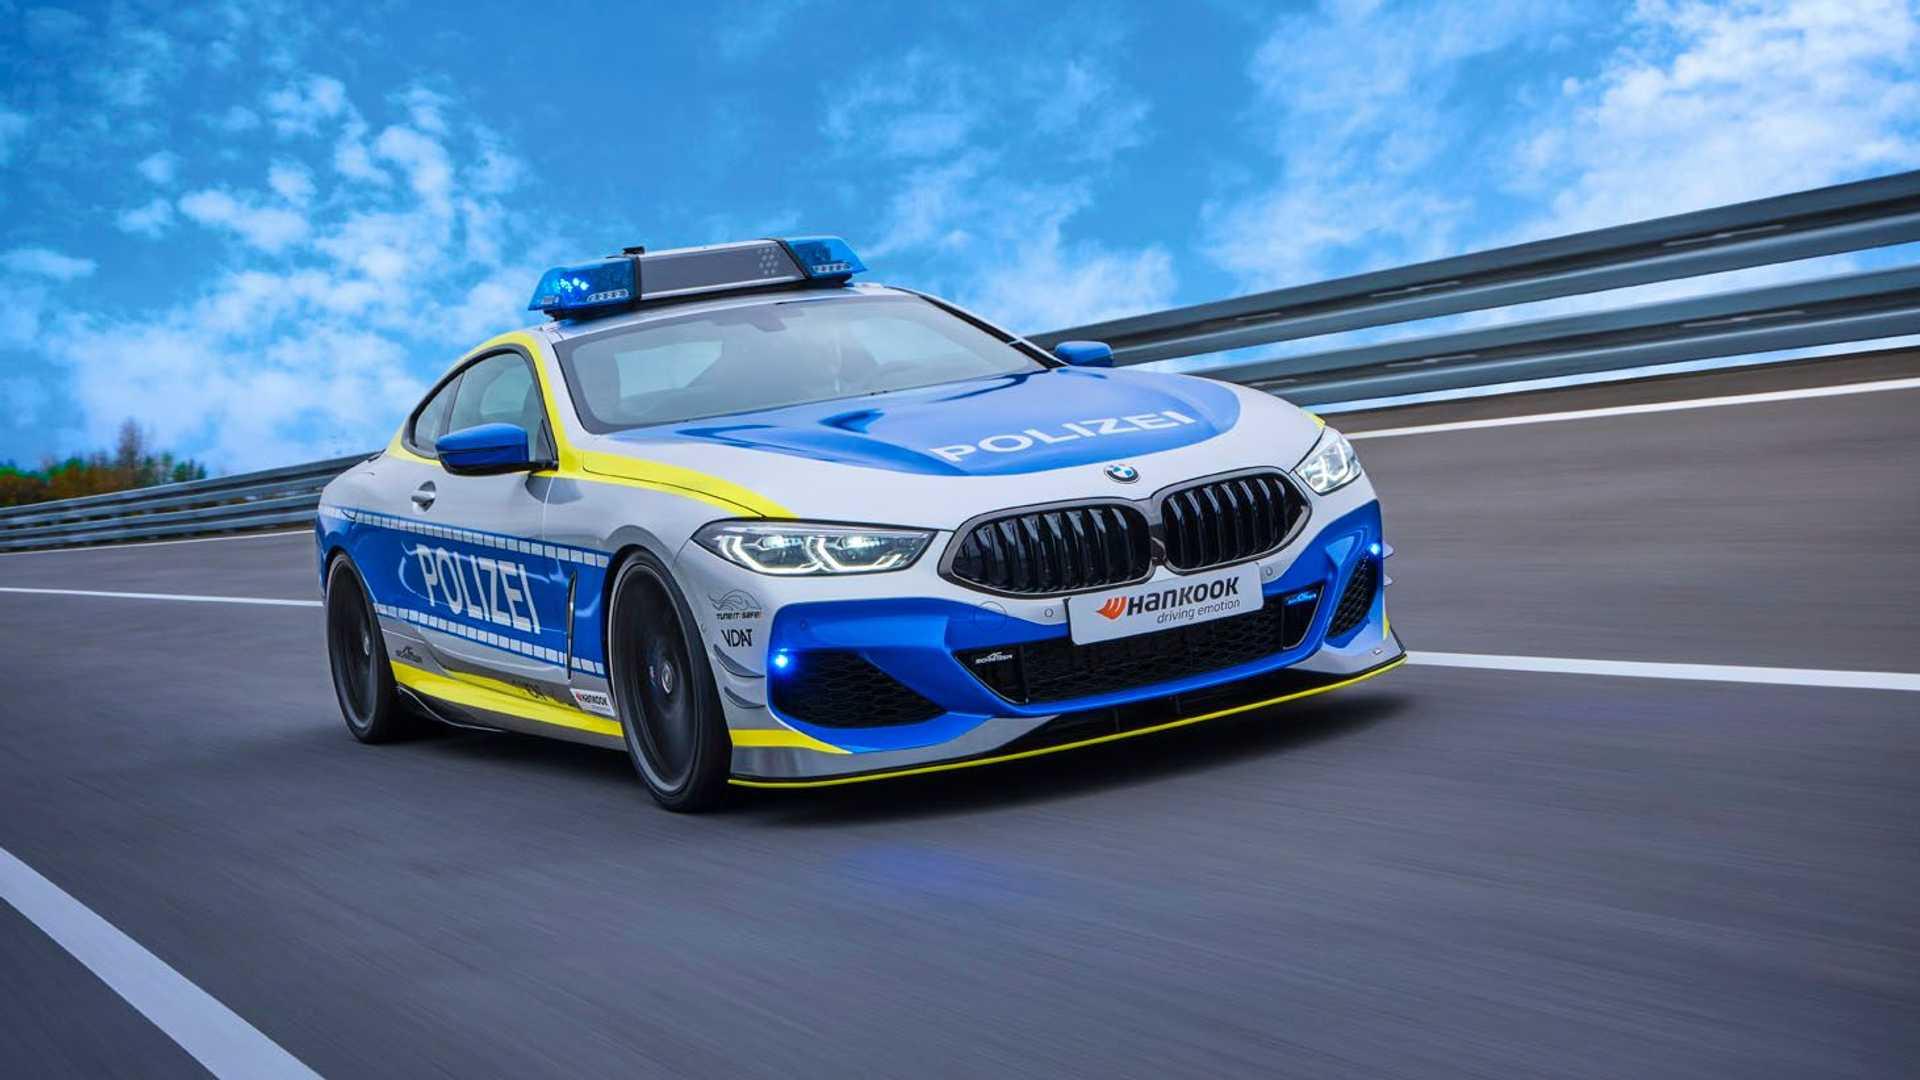 BMW-M850i-police-car-tune-it-safe-16